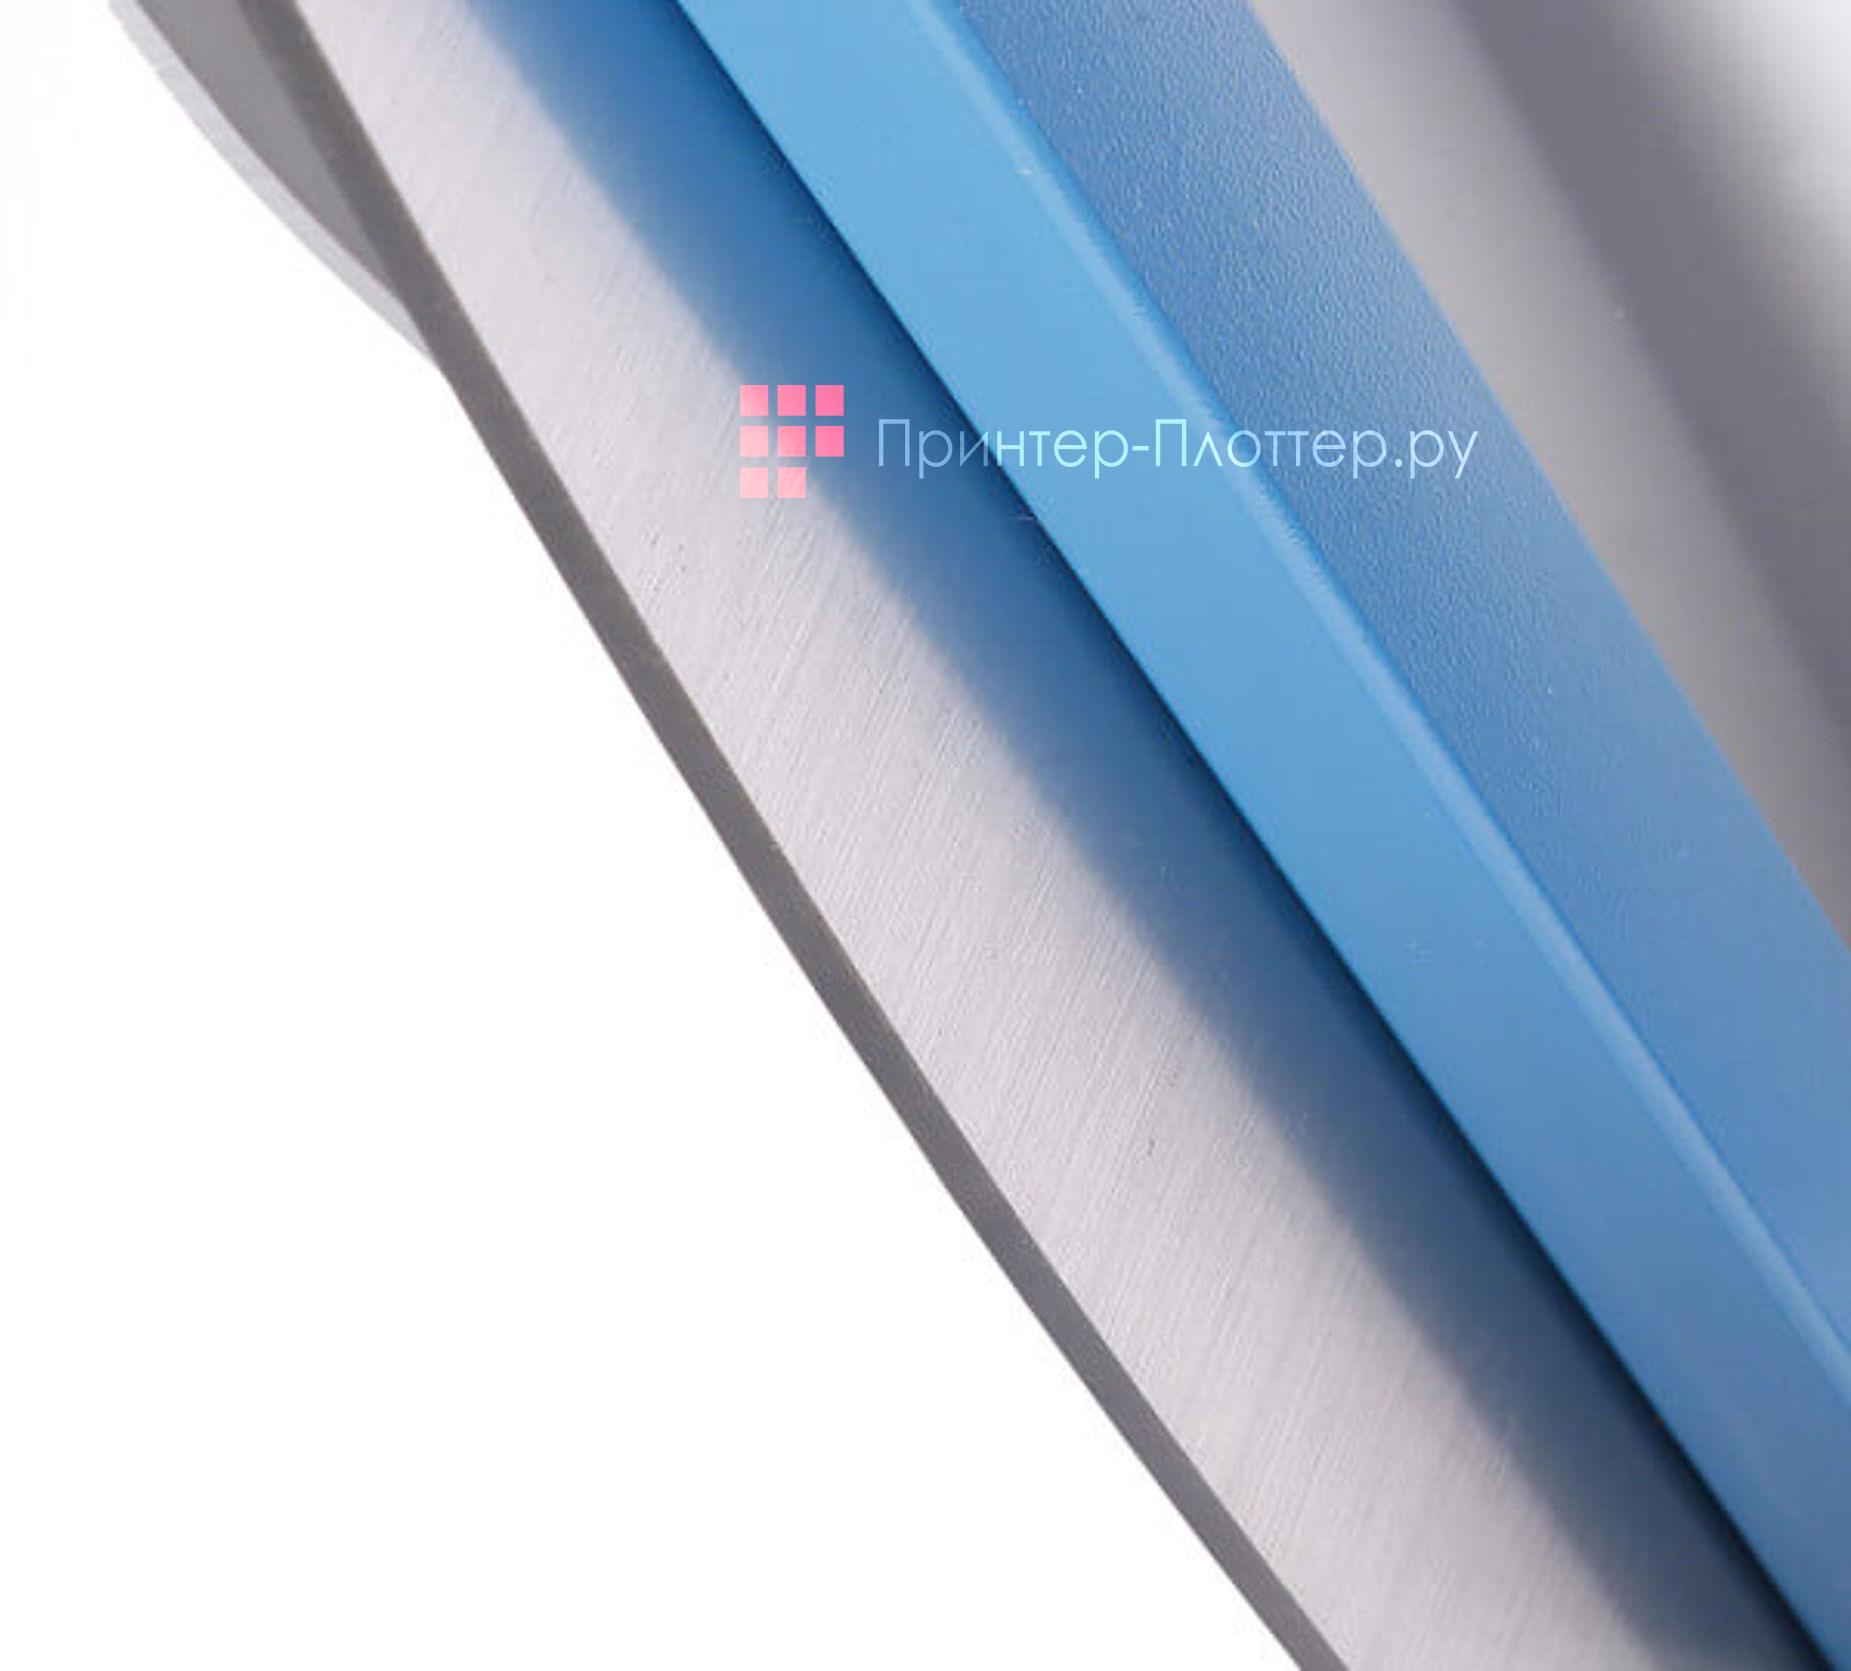 Dahle 599. Нож для материалов